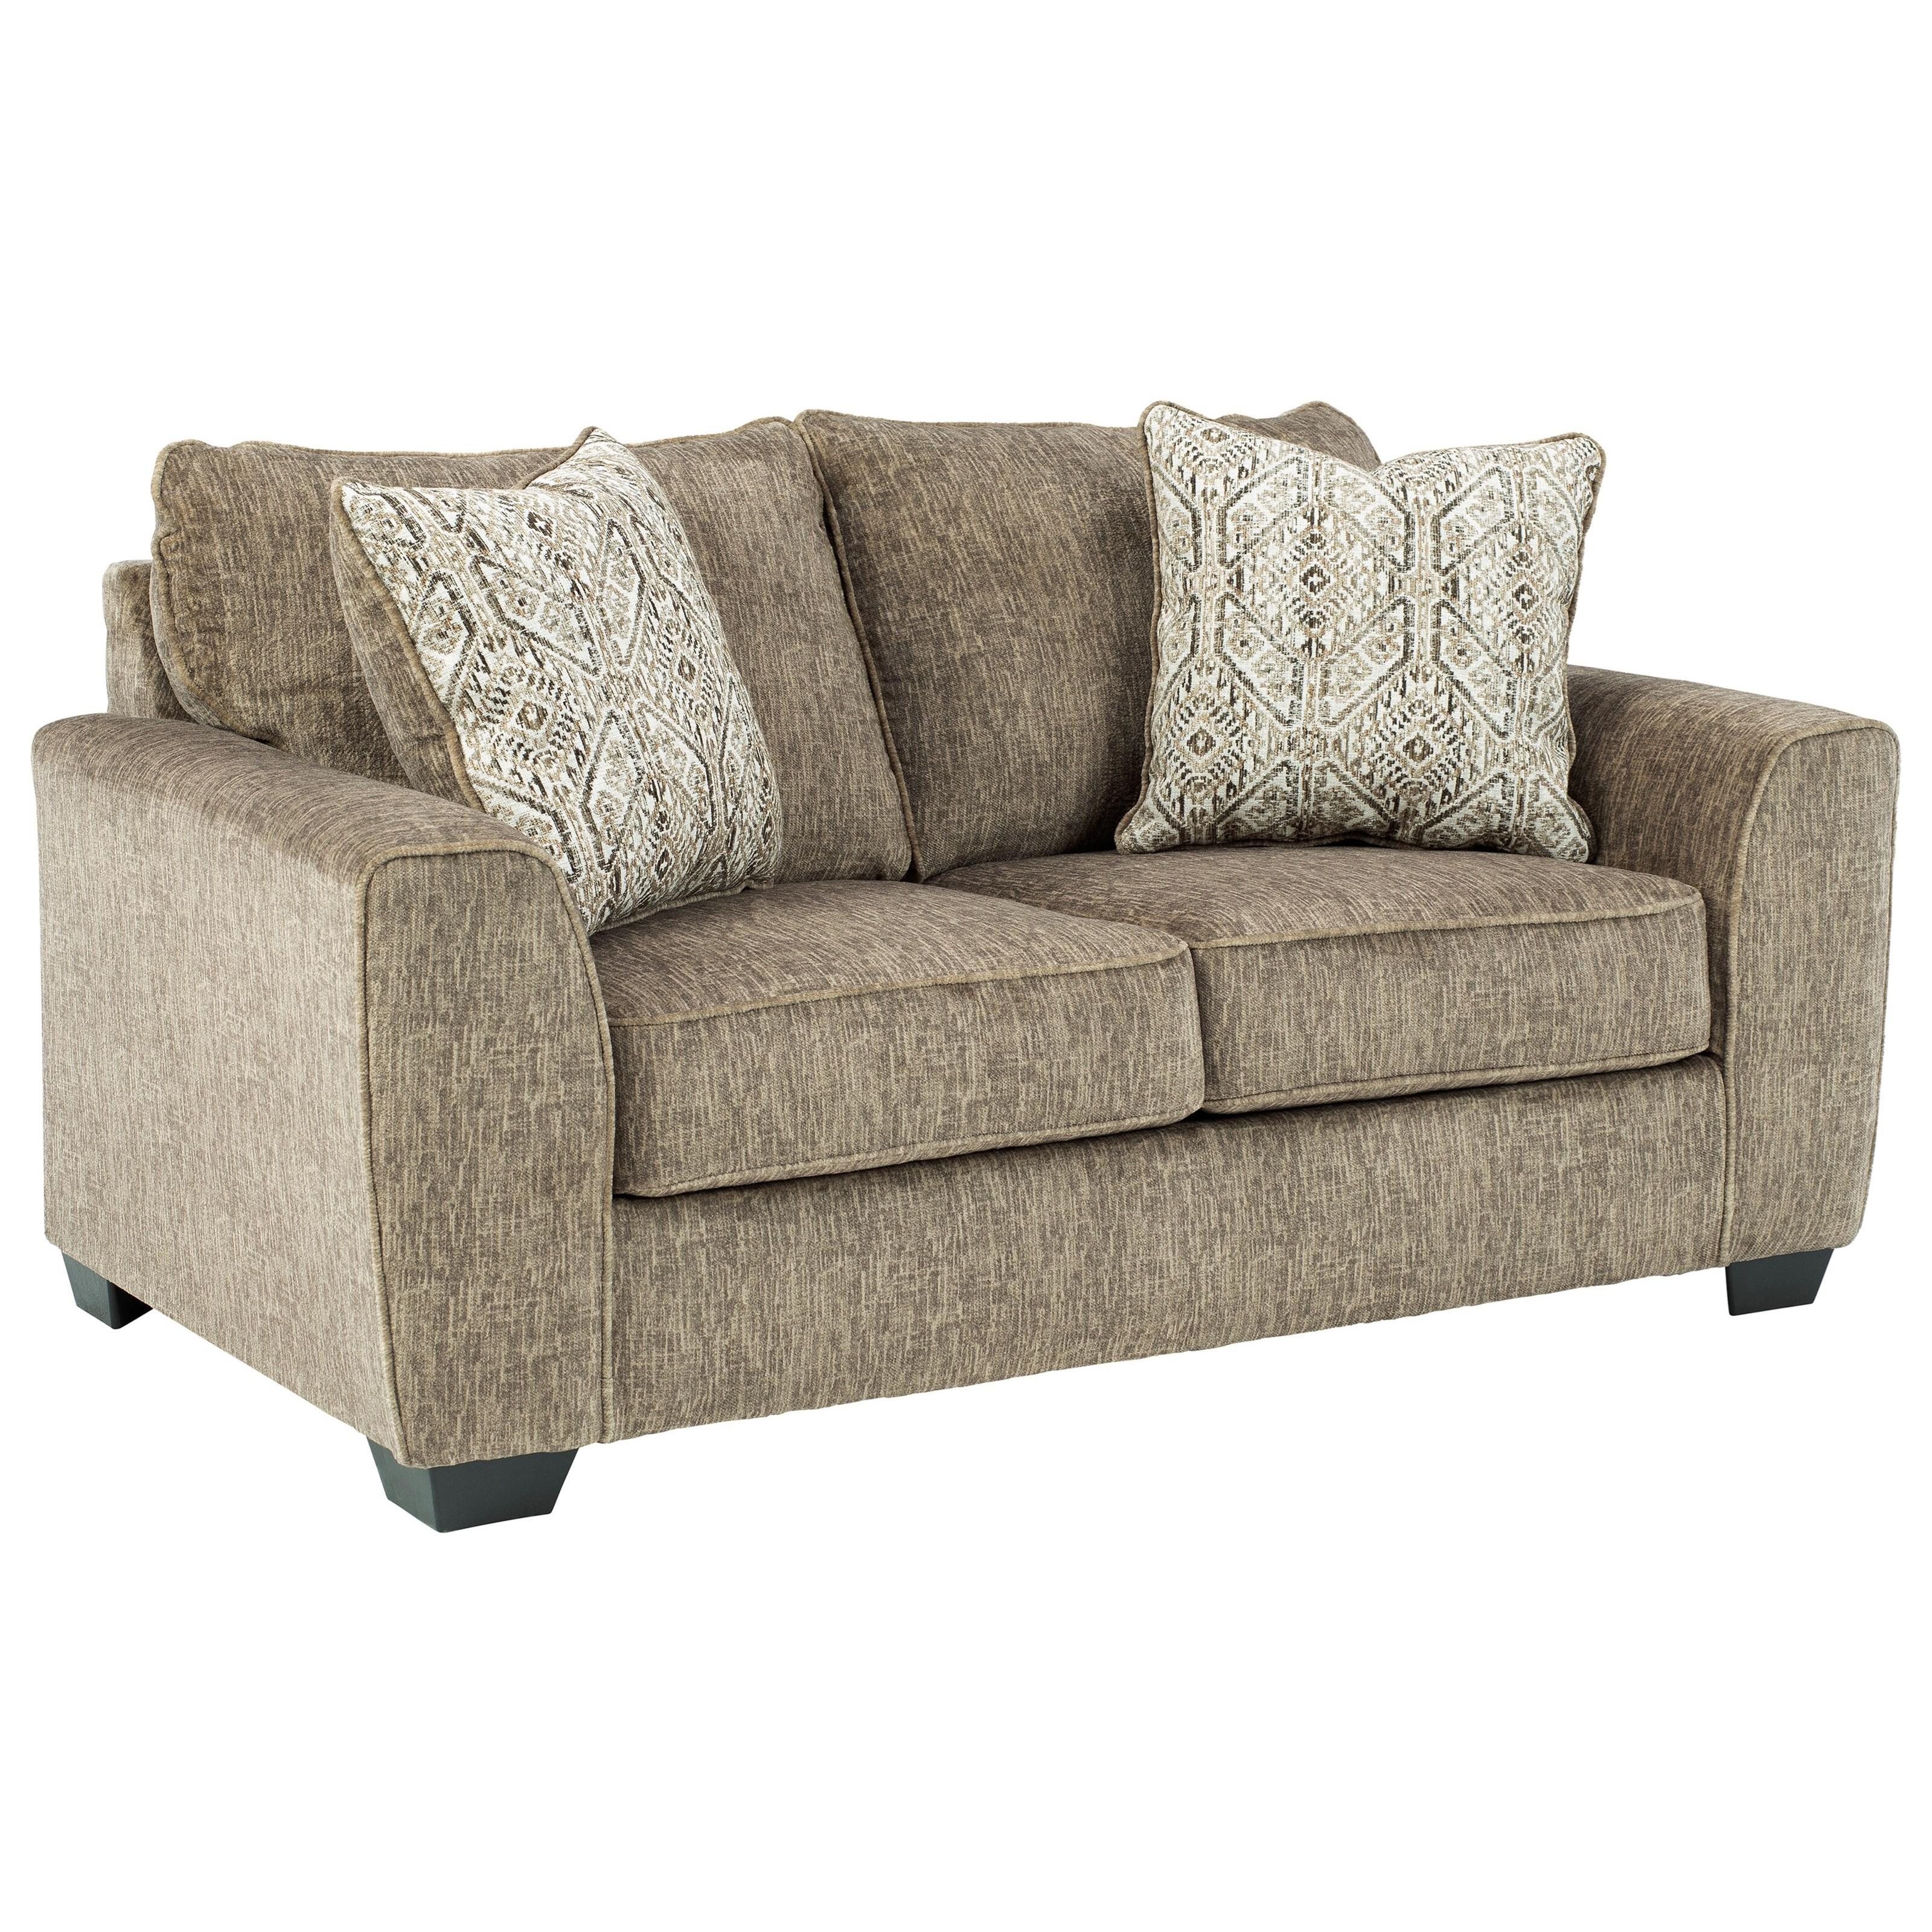 Benchcraft Olin Contemporary Loveseat Wayside Furniture Loveseats